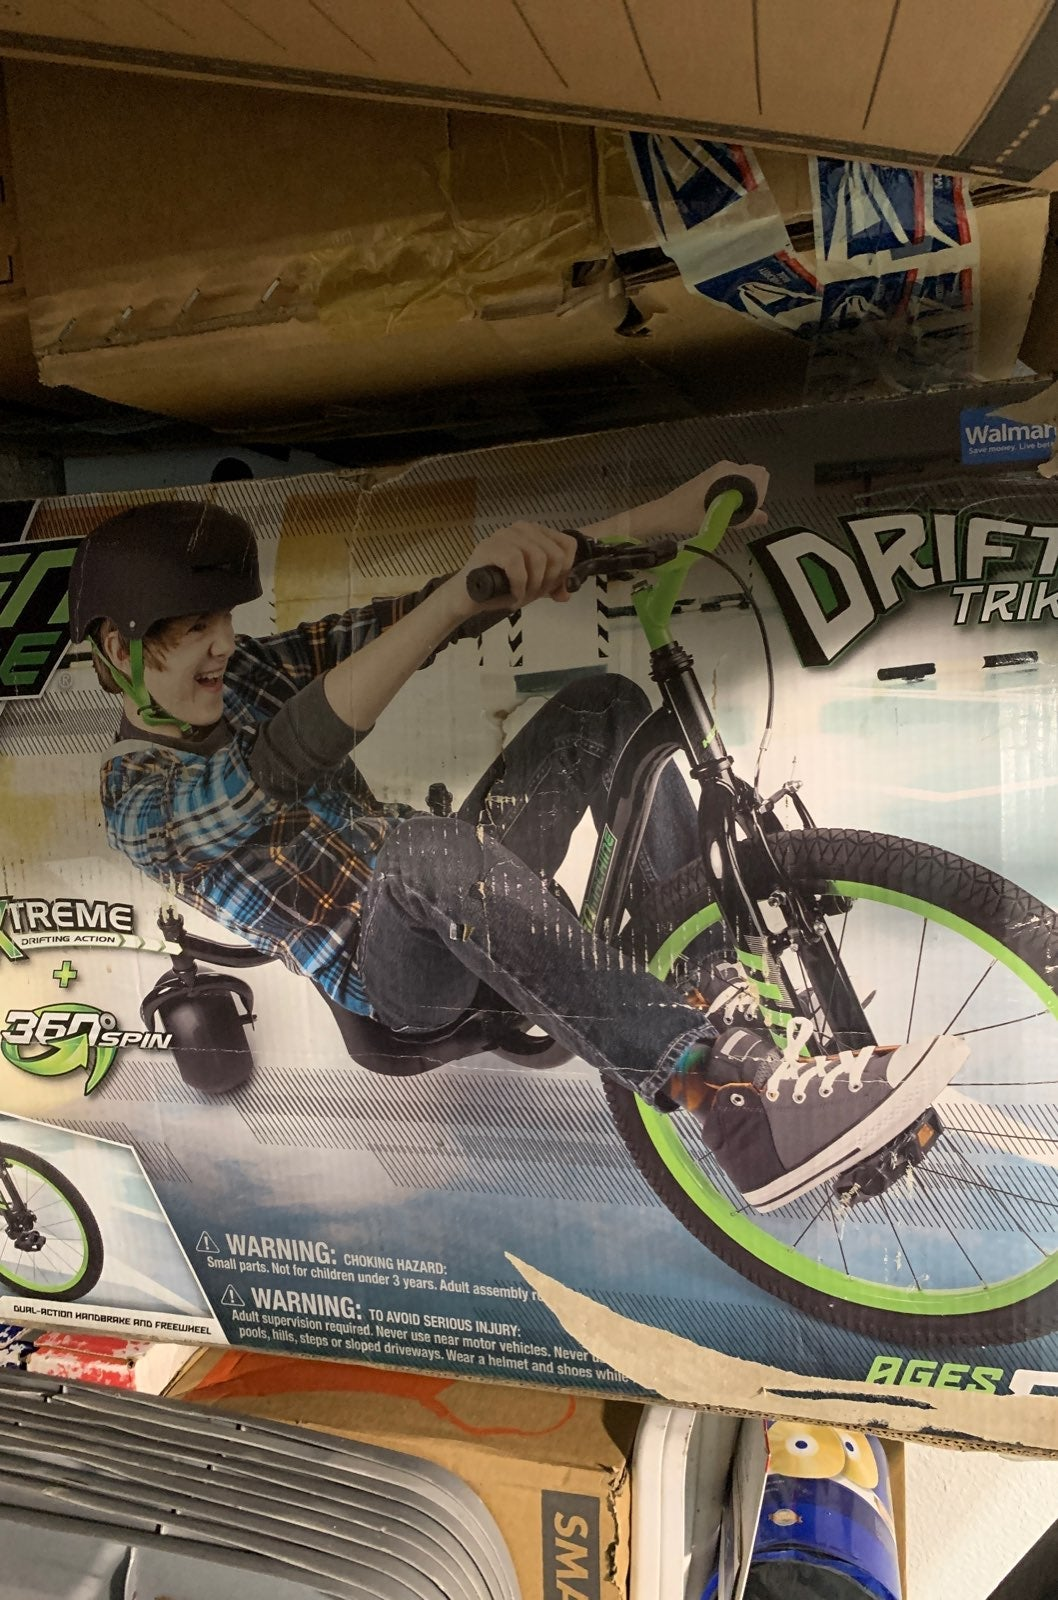 Drift trike green machine new